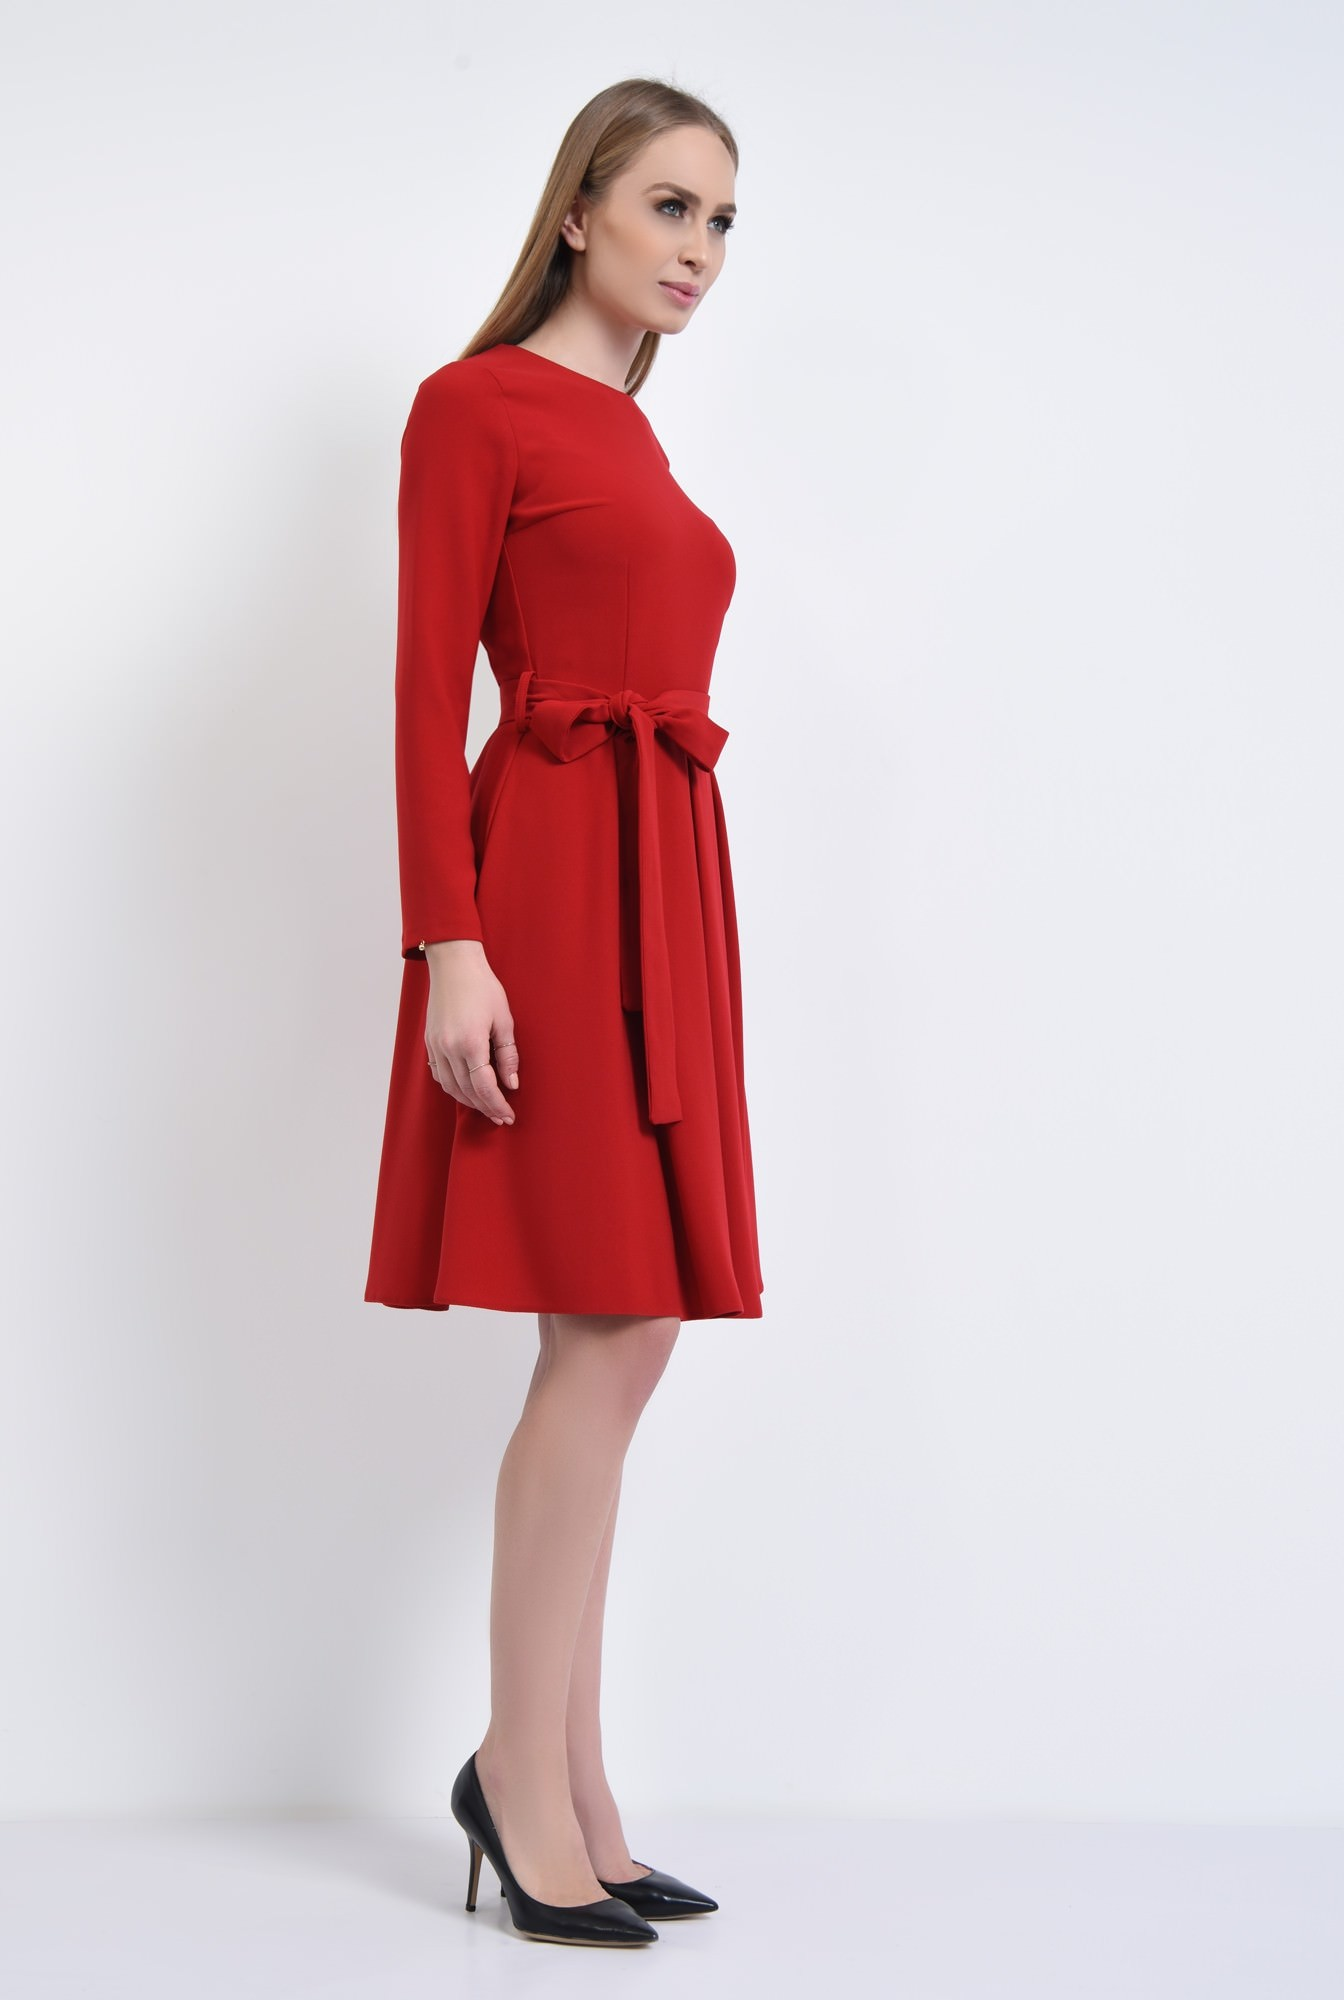 3 - rochie casual, midi, plisata, cordon, rosu